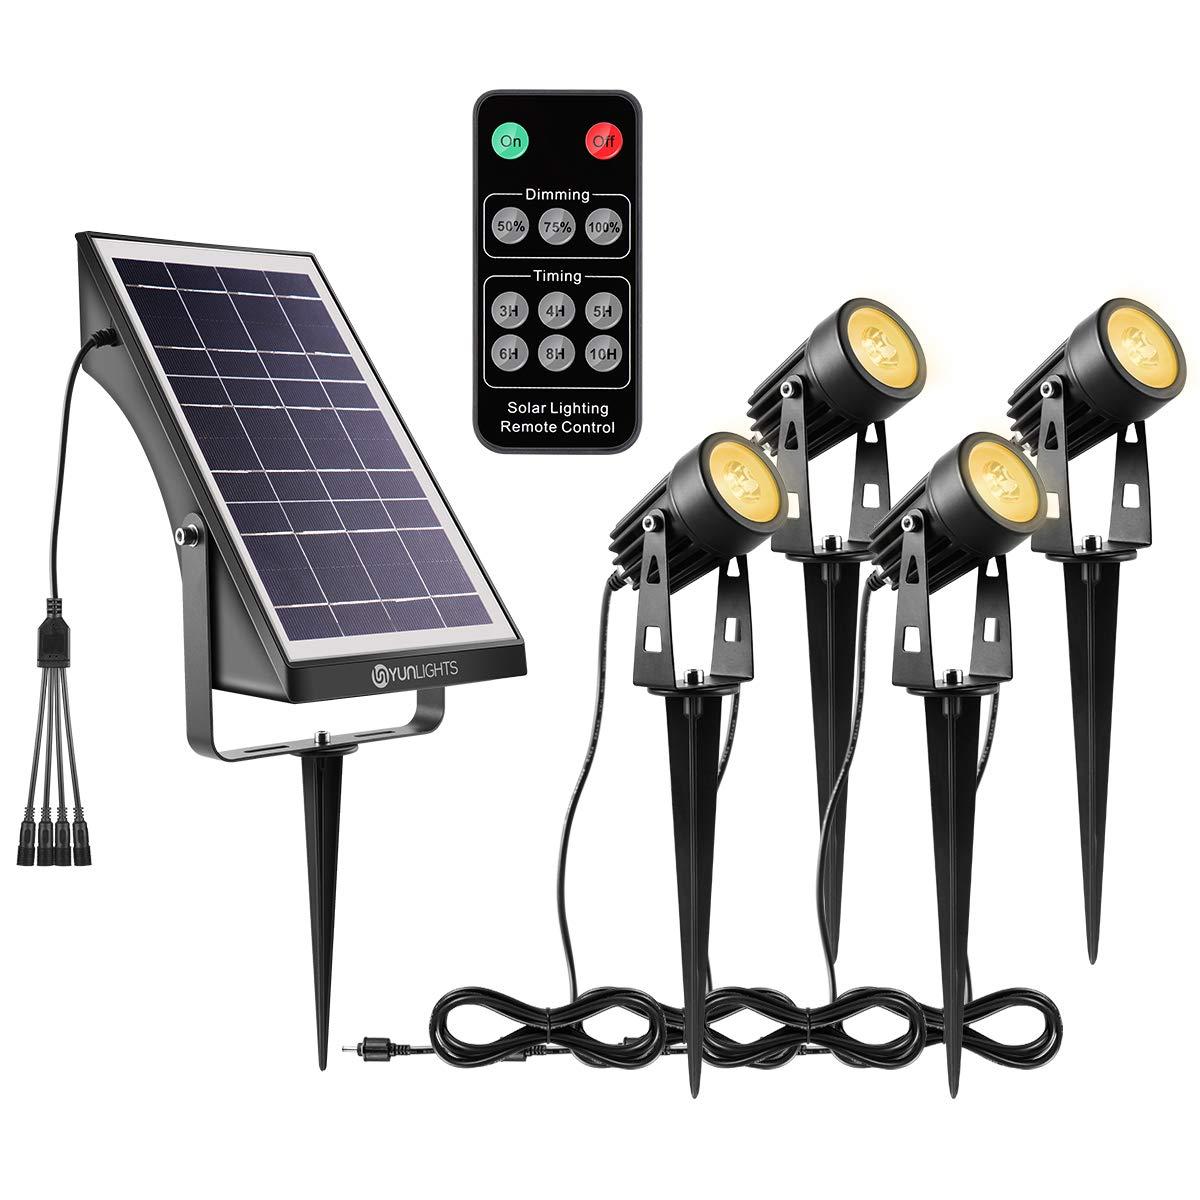 YUNLIGHTS Solar Landscape Lights, Low Voltage Outdoor Solar Spotlight Wireless Remote Control Waterproof Garden Lights for Patio, Yard, Pathway (Warm White, 4 Pack)